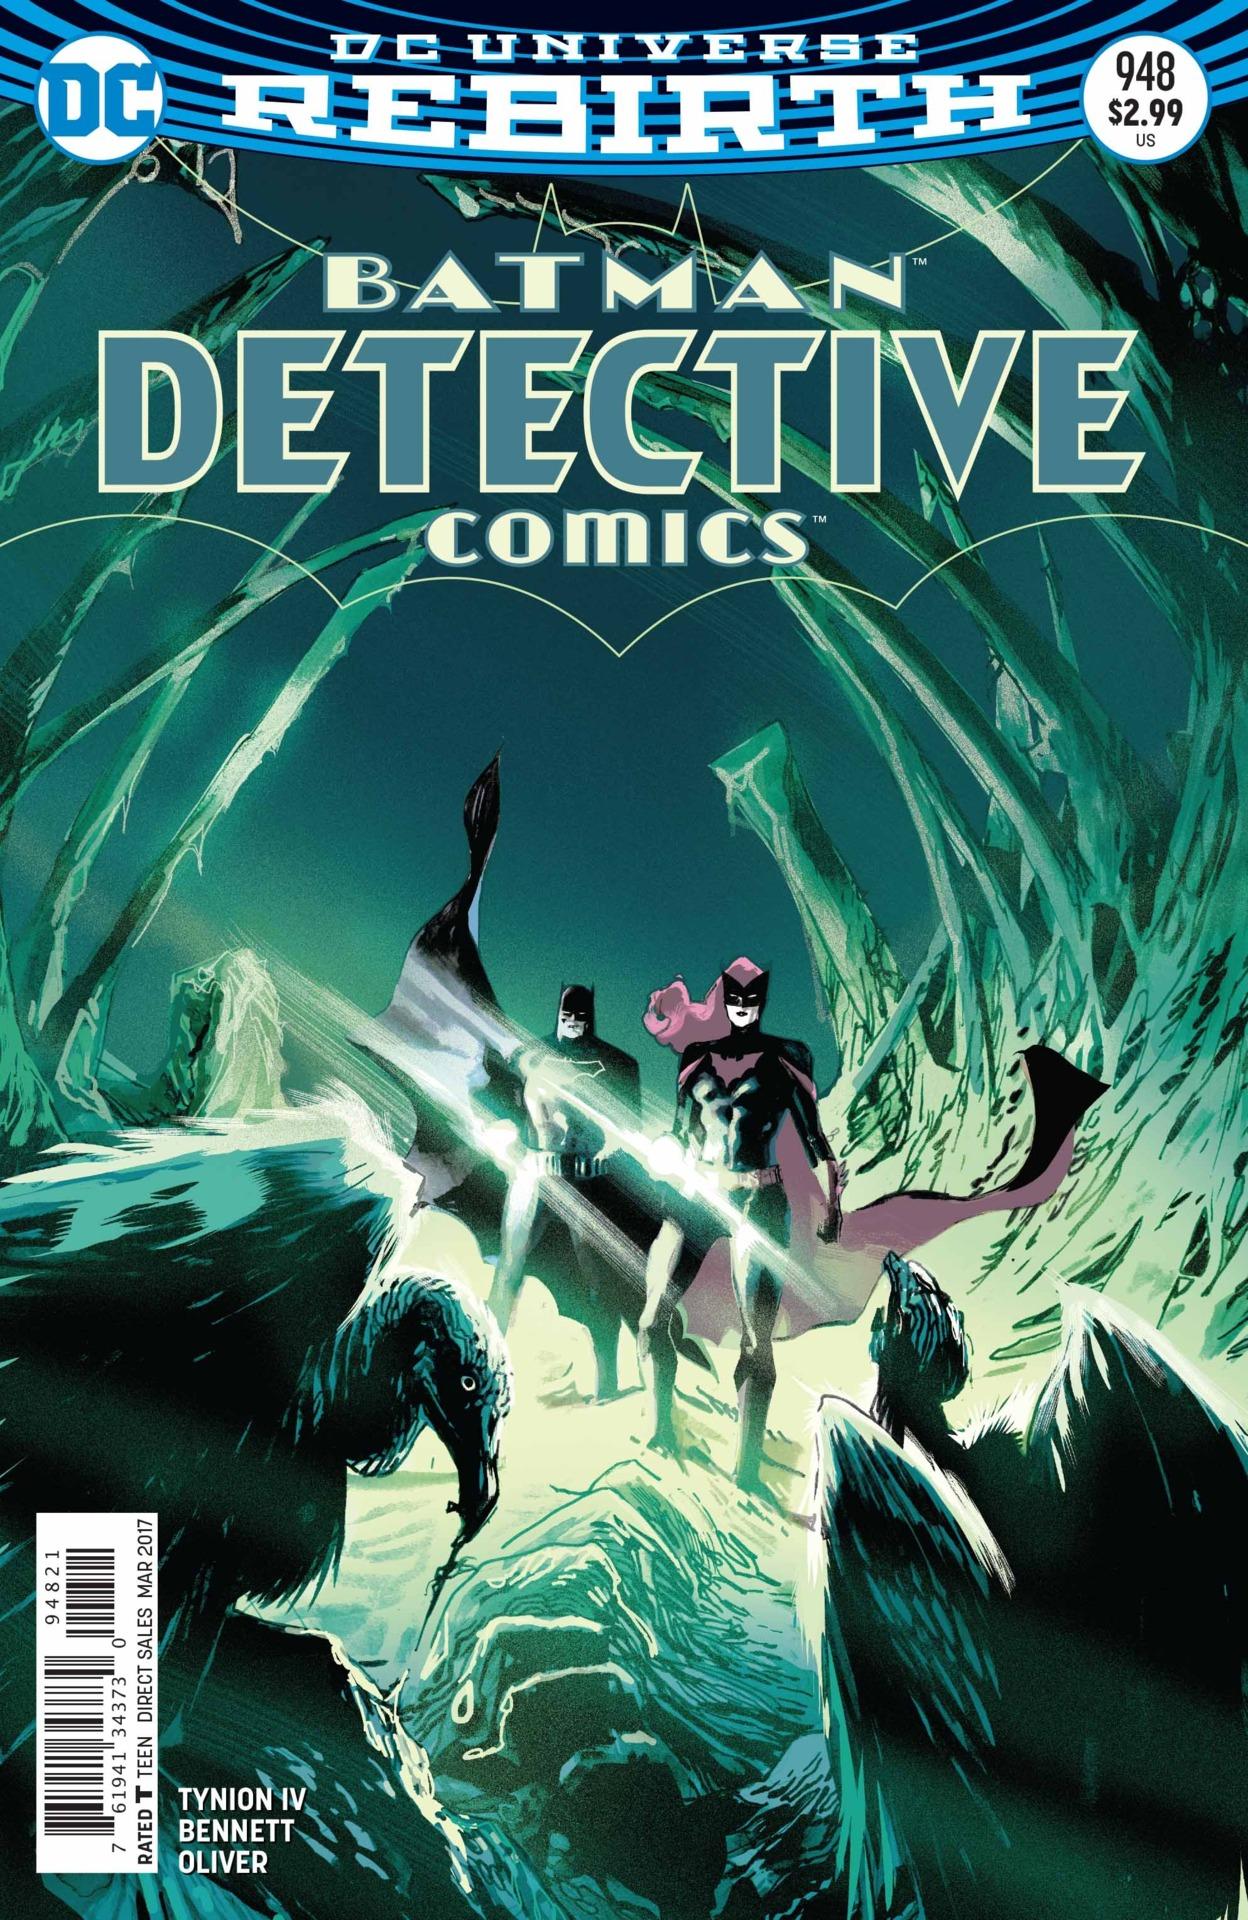 Detective Comics #948 variant by Rafael Albuquerque